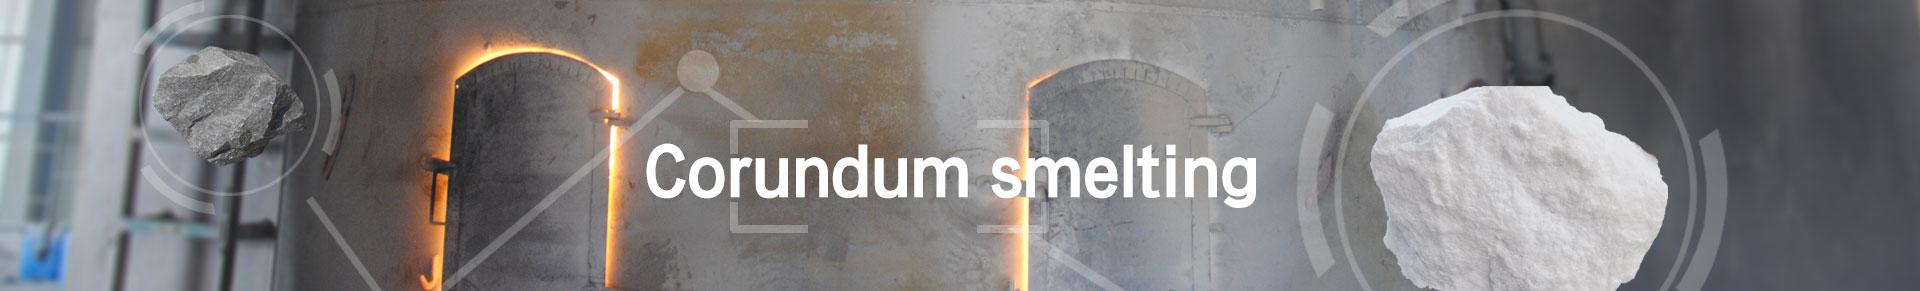 corundum Smelting